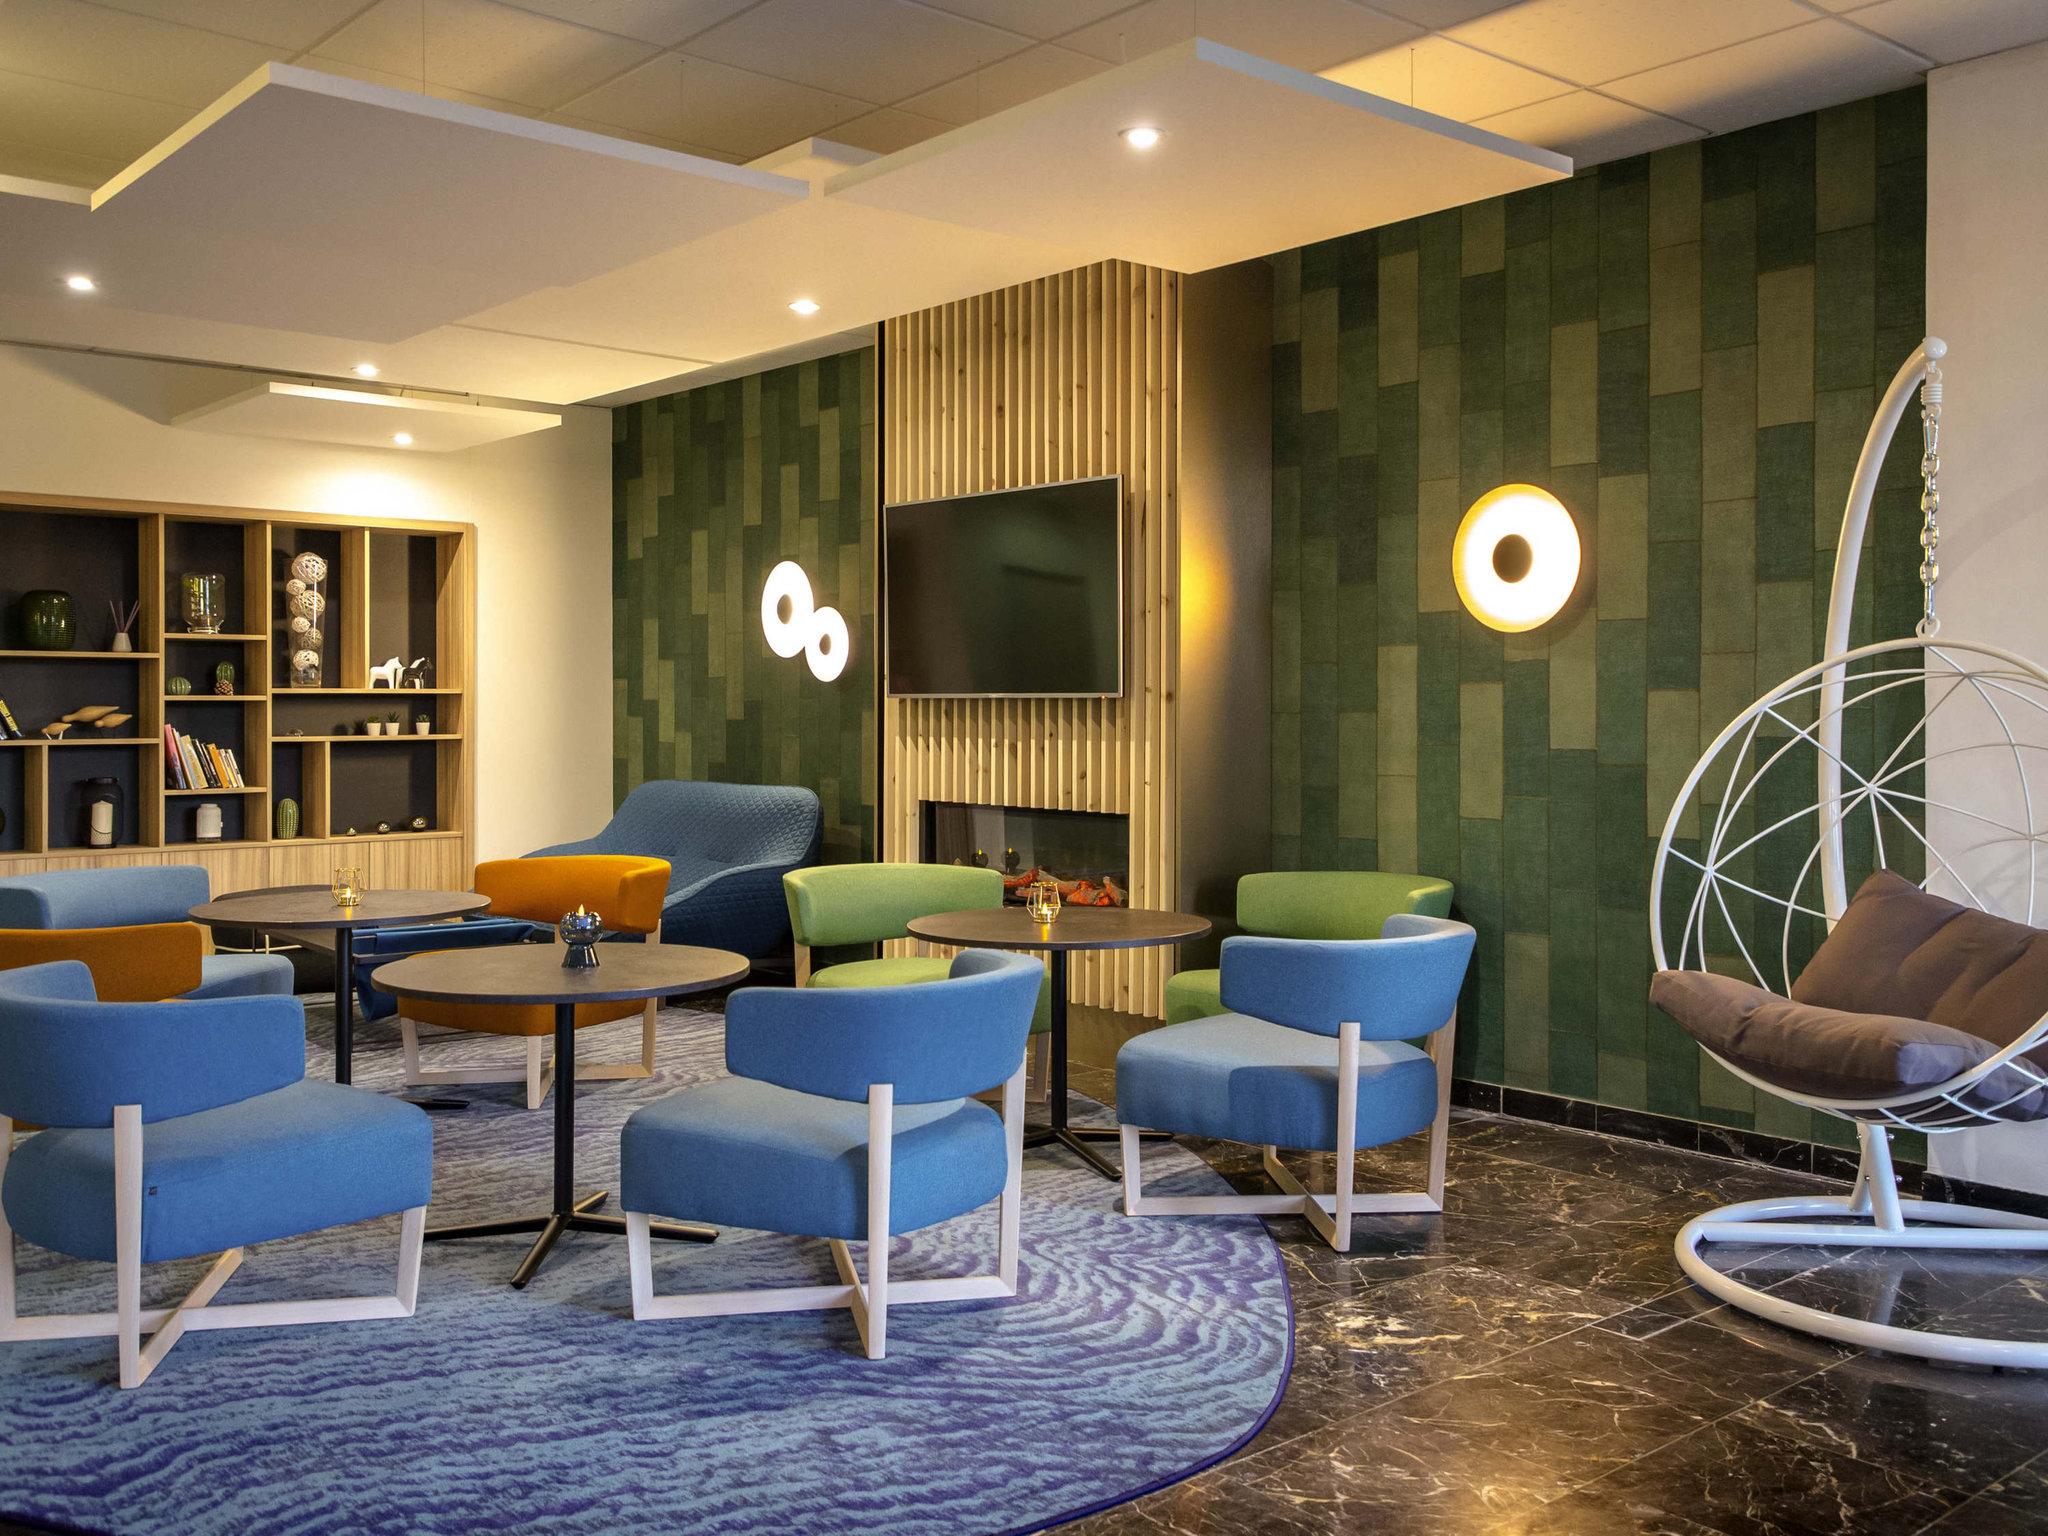 Hotel Ibis Cavaillon